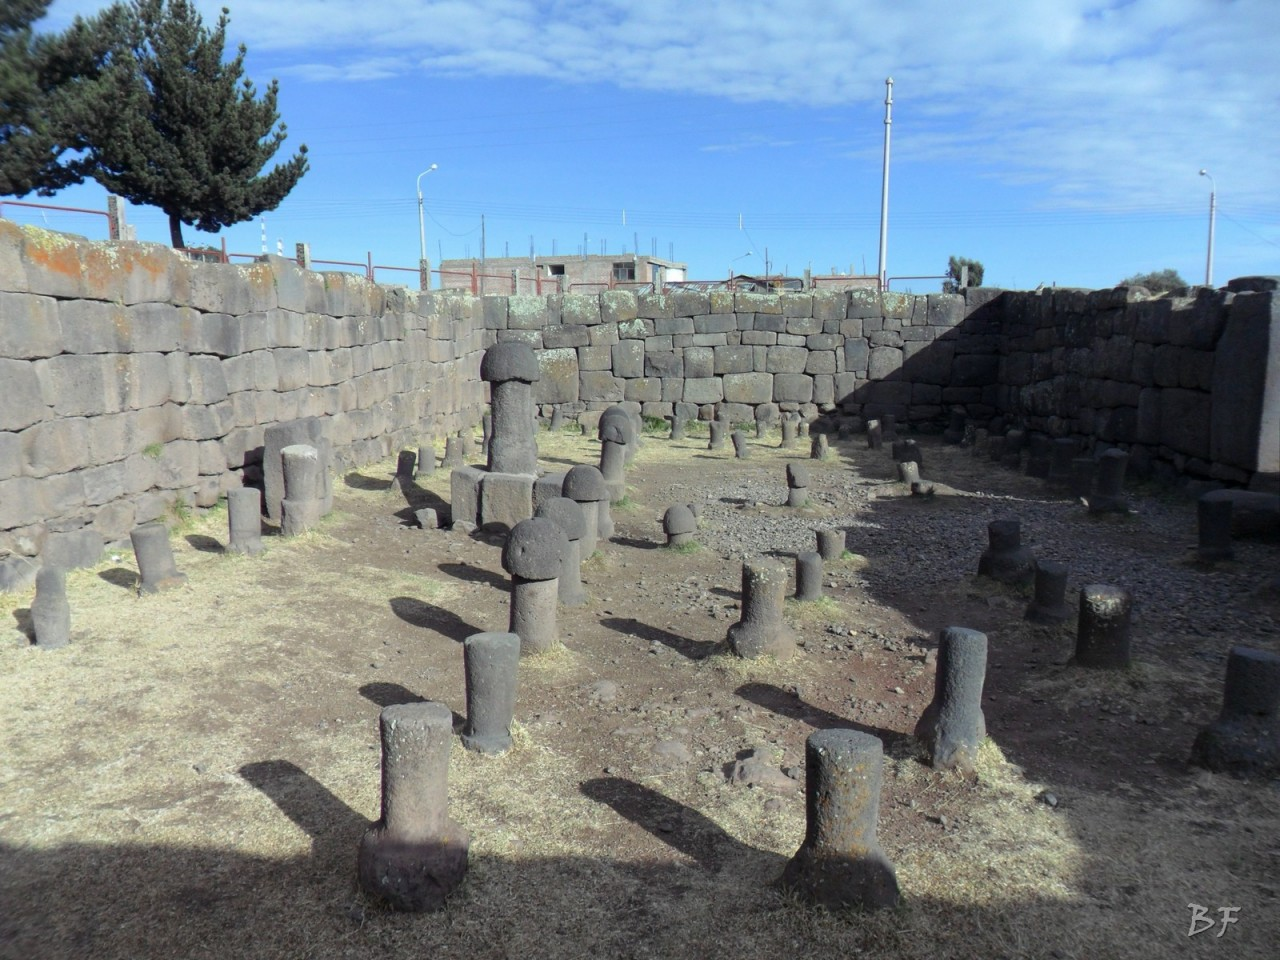 Mura-Poligonali-Megaliti-Inca-Uyo-Puno-Perù-4